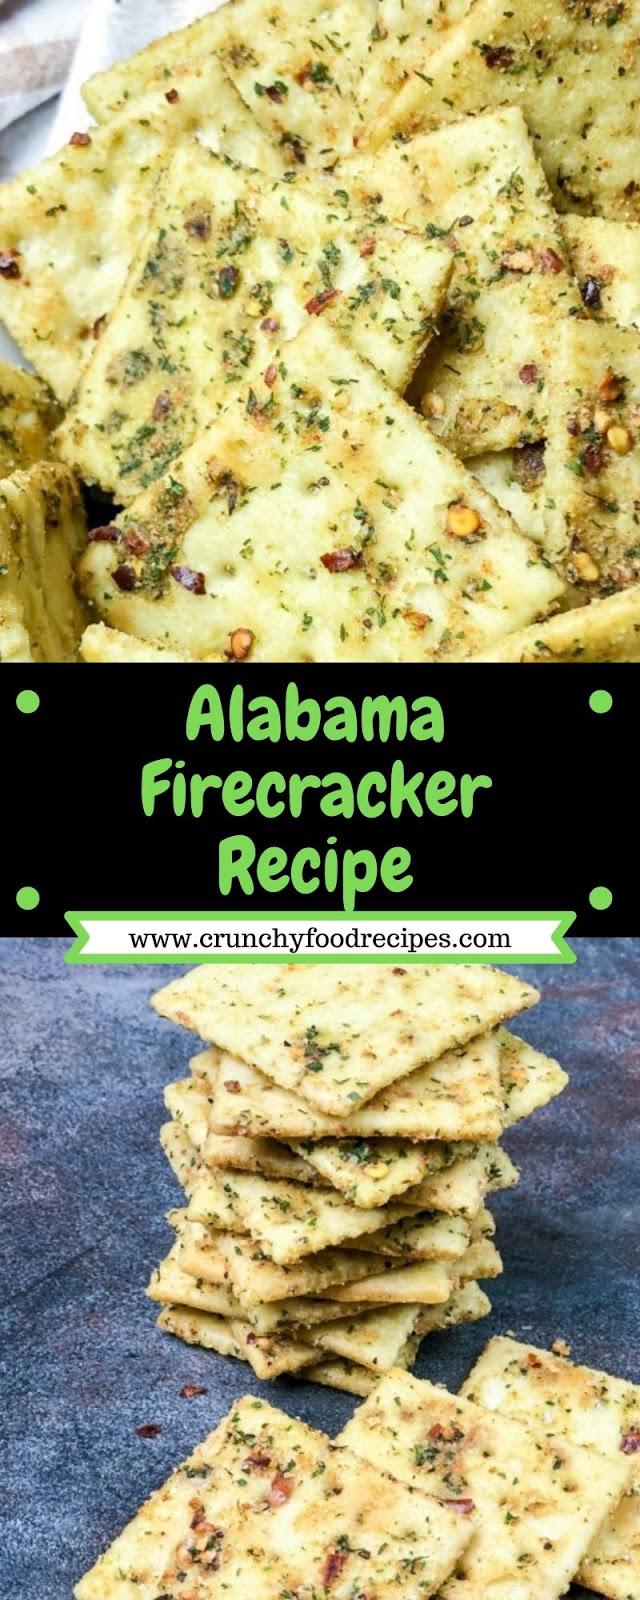 Alabama Firecracker Recipe